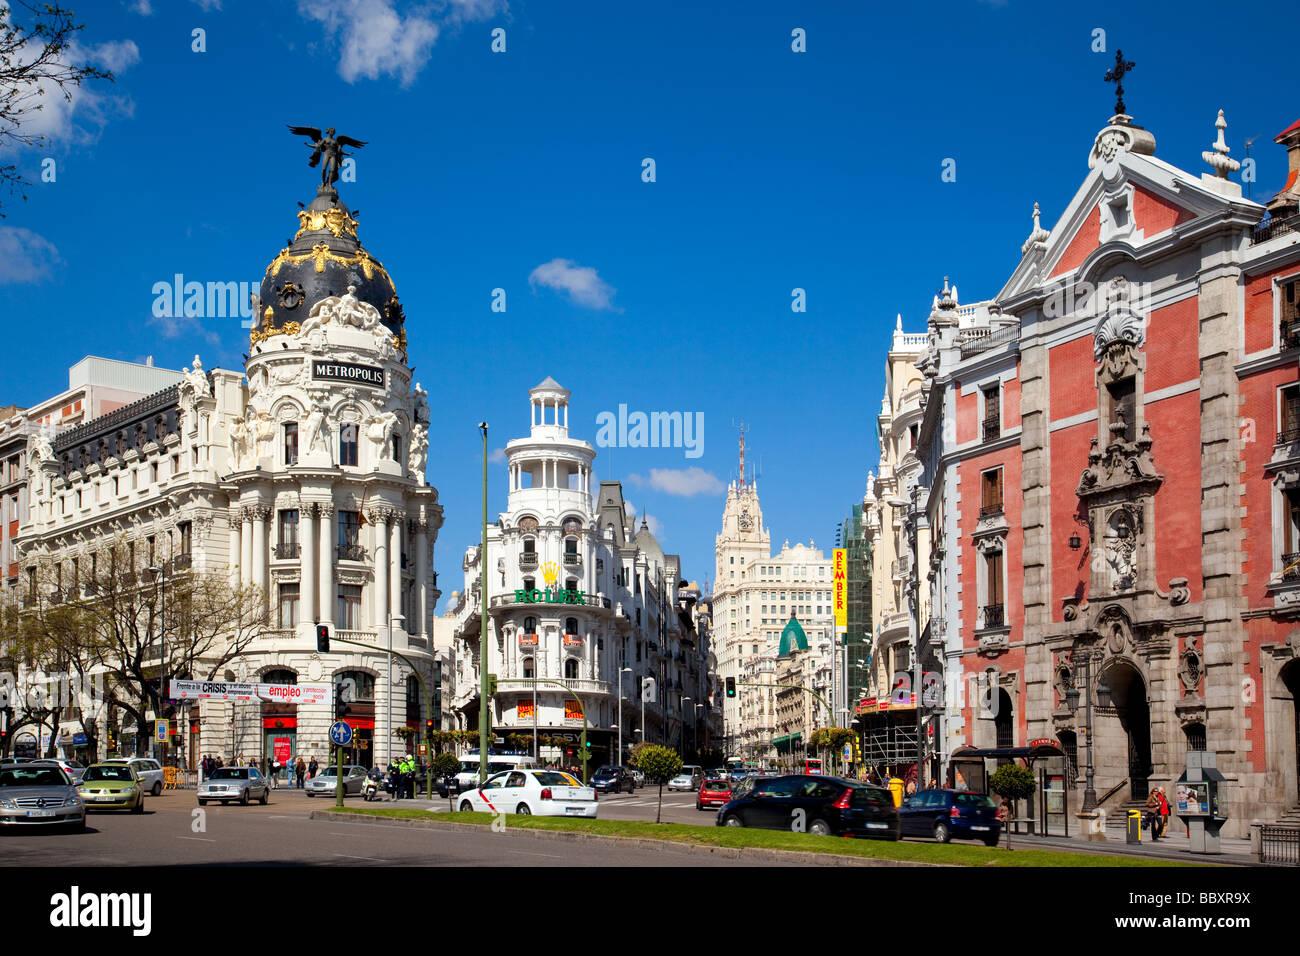 Gran Via Madid Spain - Stock Image